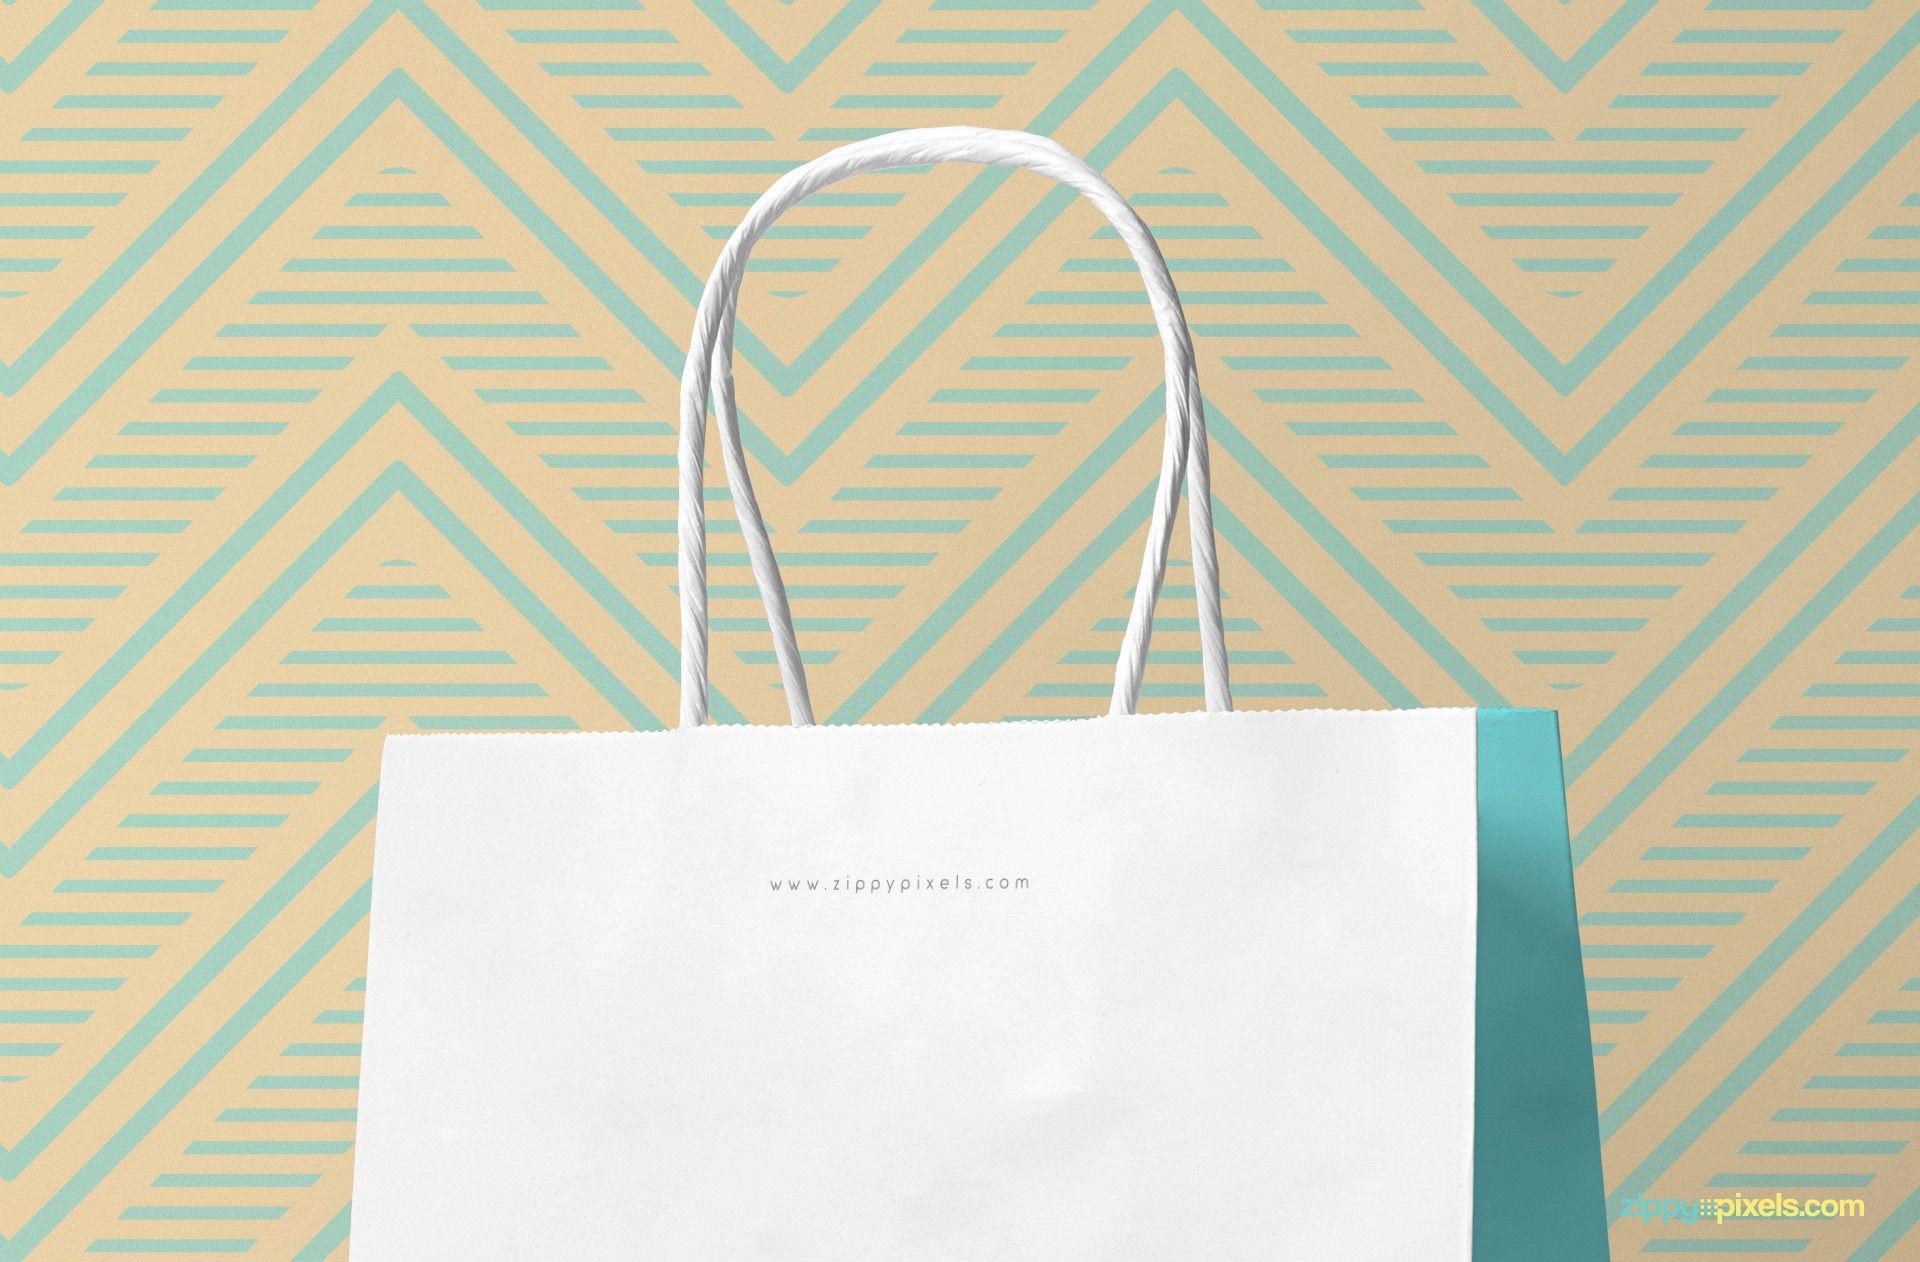 Download Free Attractive Gift Bag Mockup Zippypixels Bag Mockup Psd Templates Attractive Gift